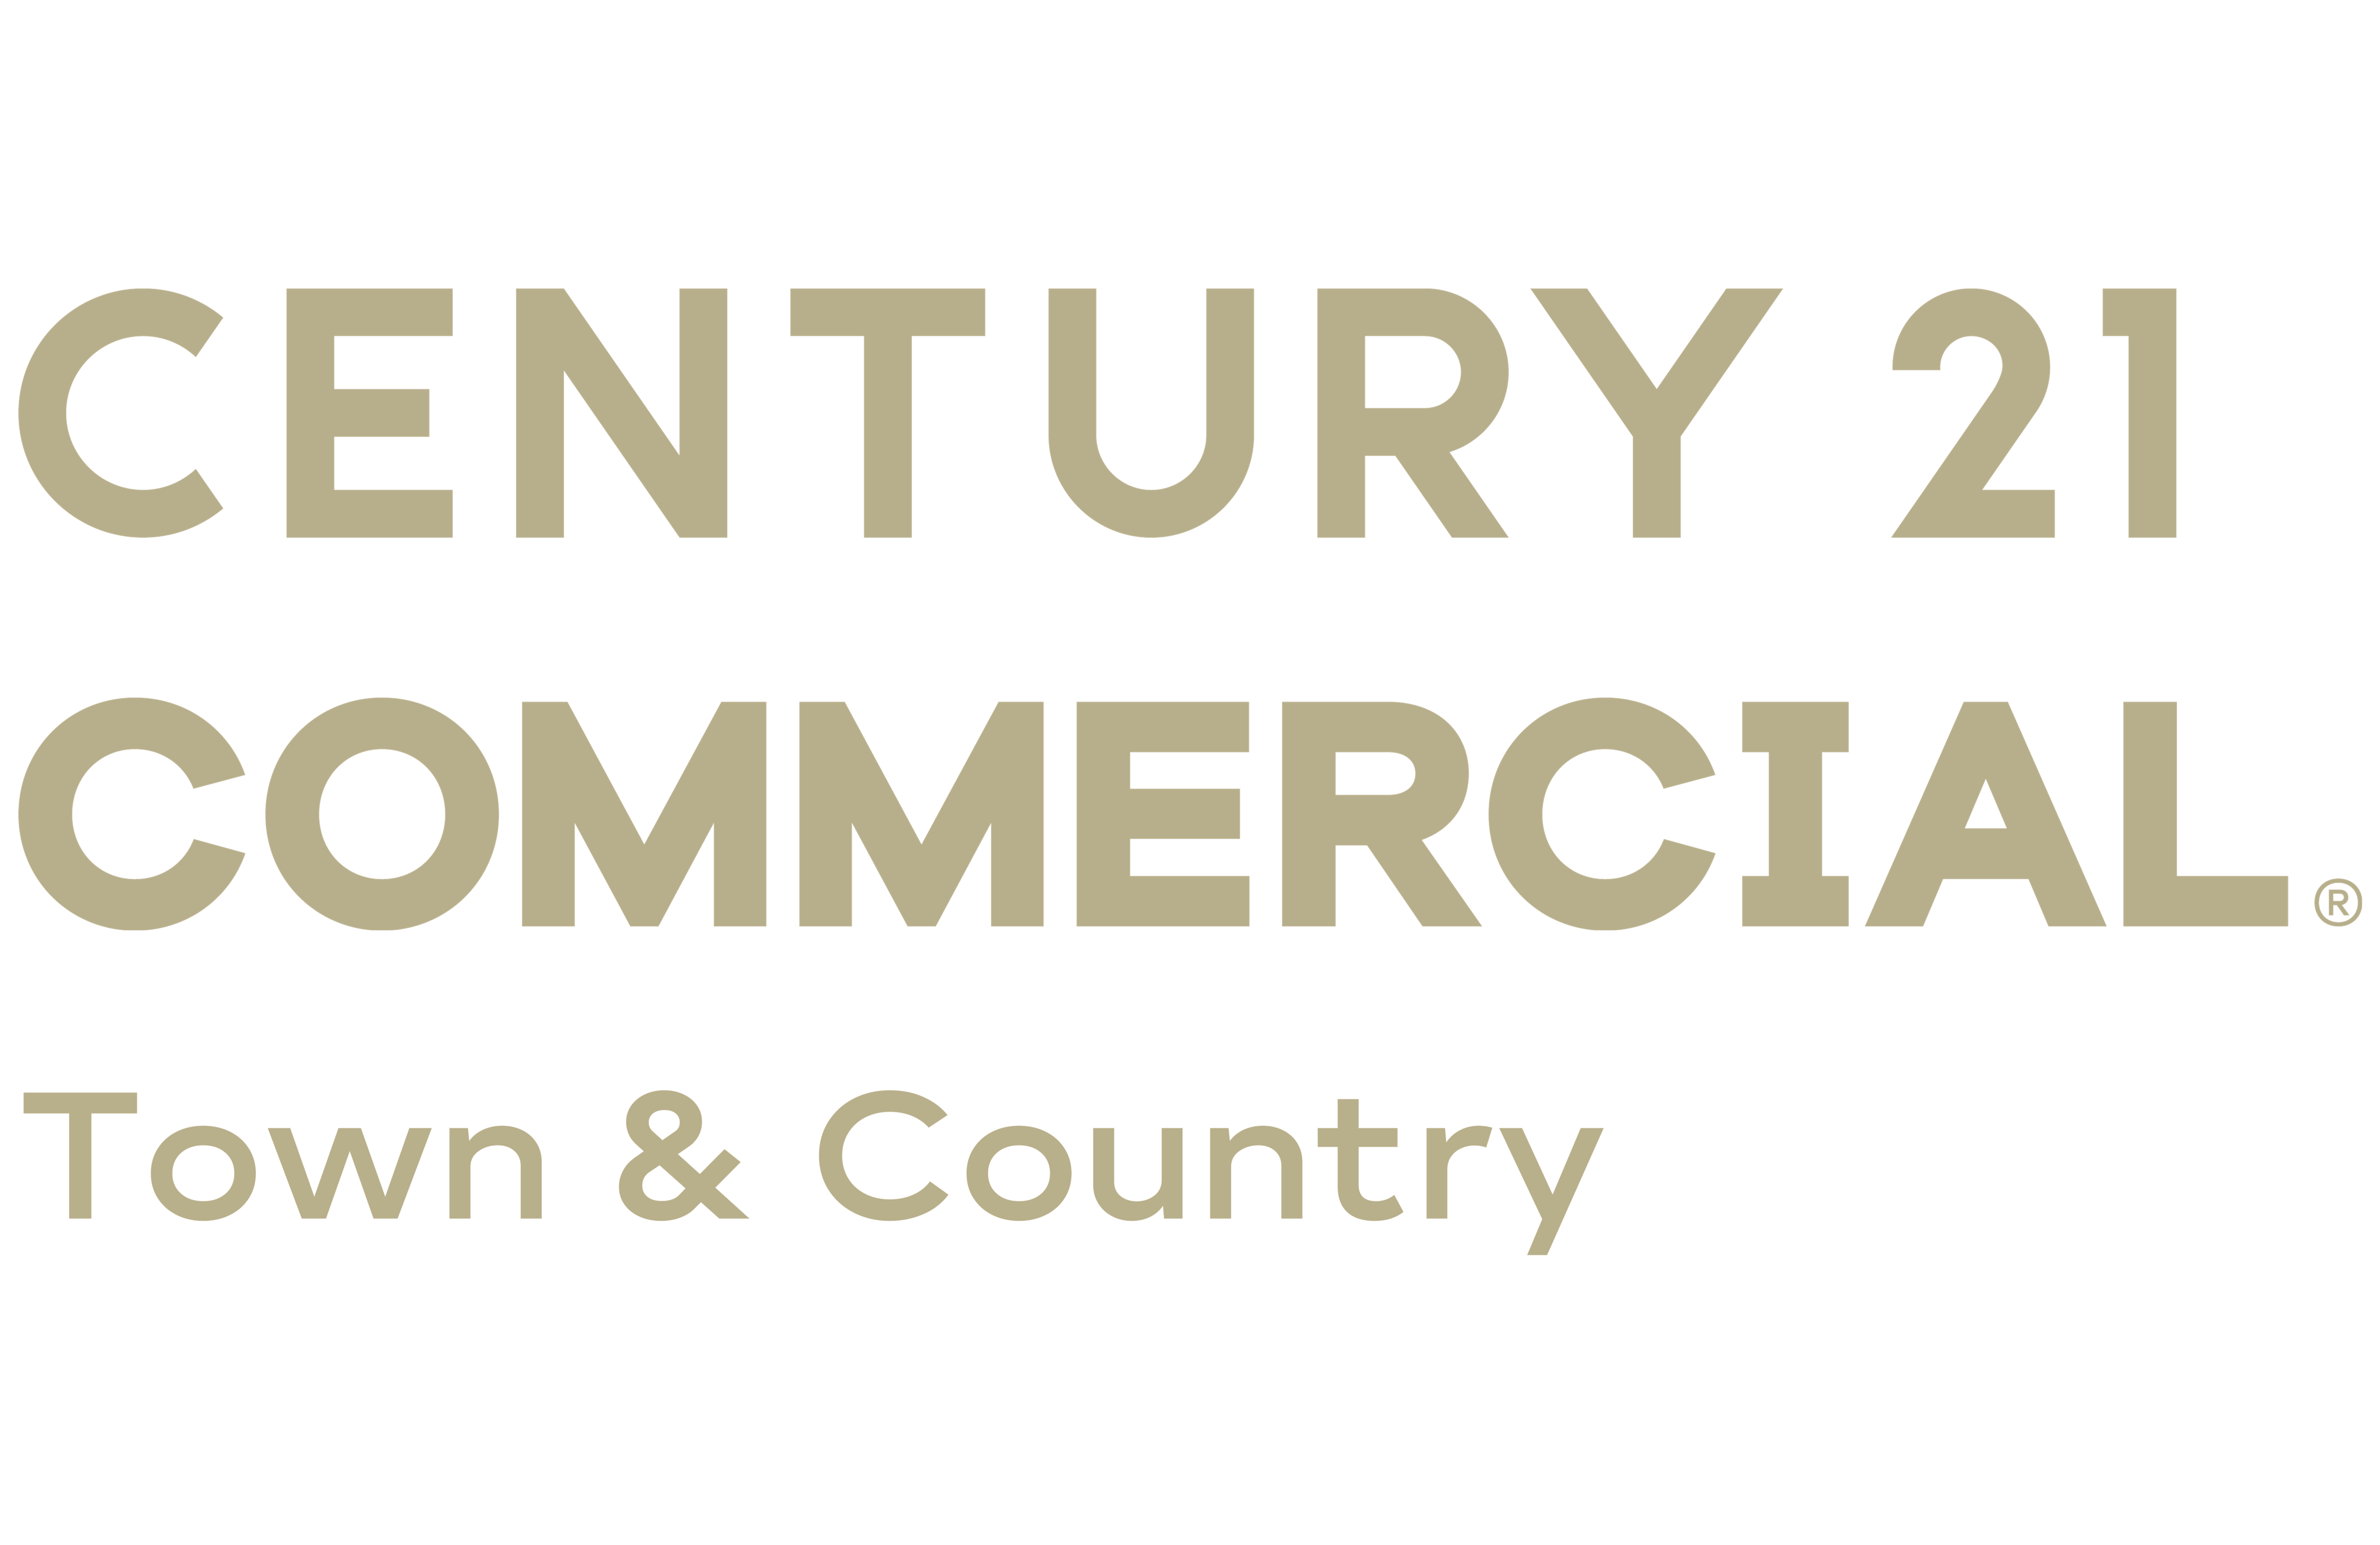 Rosa Camacho of CENTURY 21 Town & Country logo